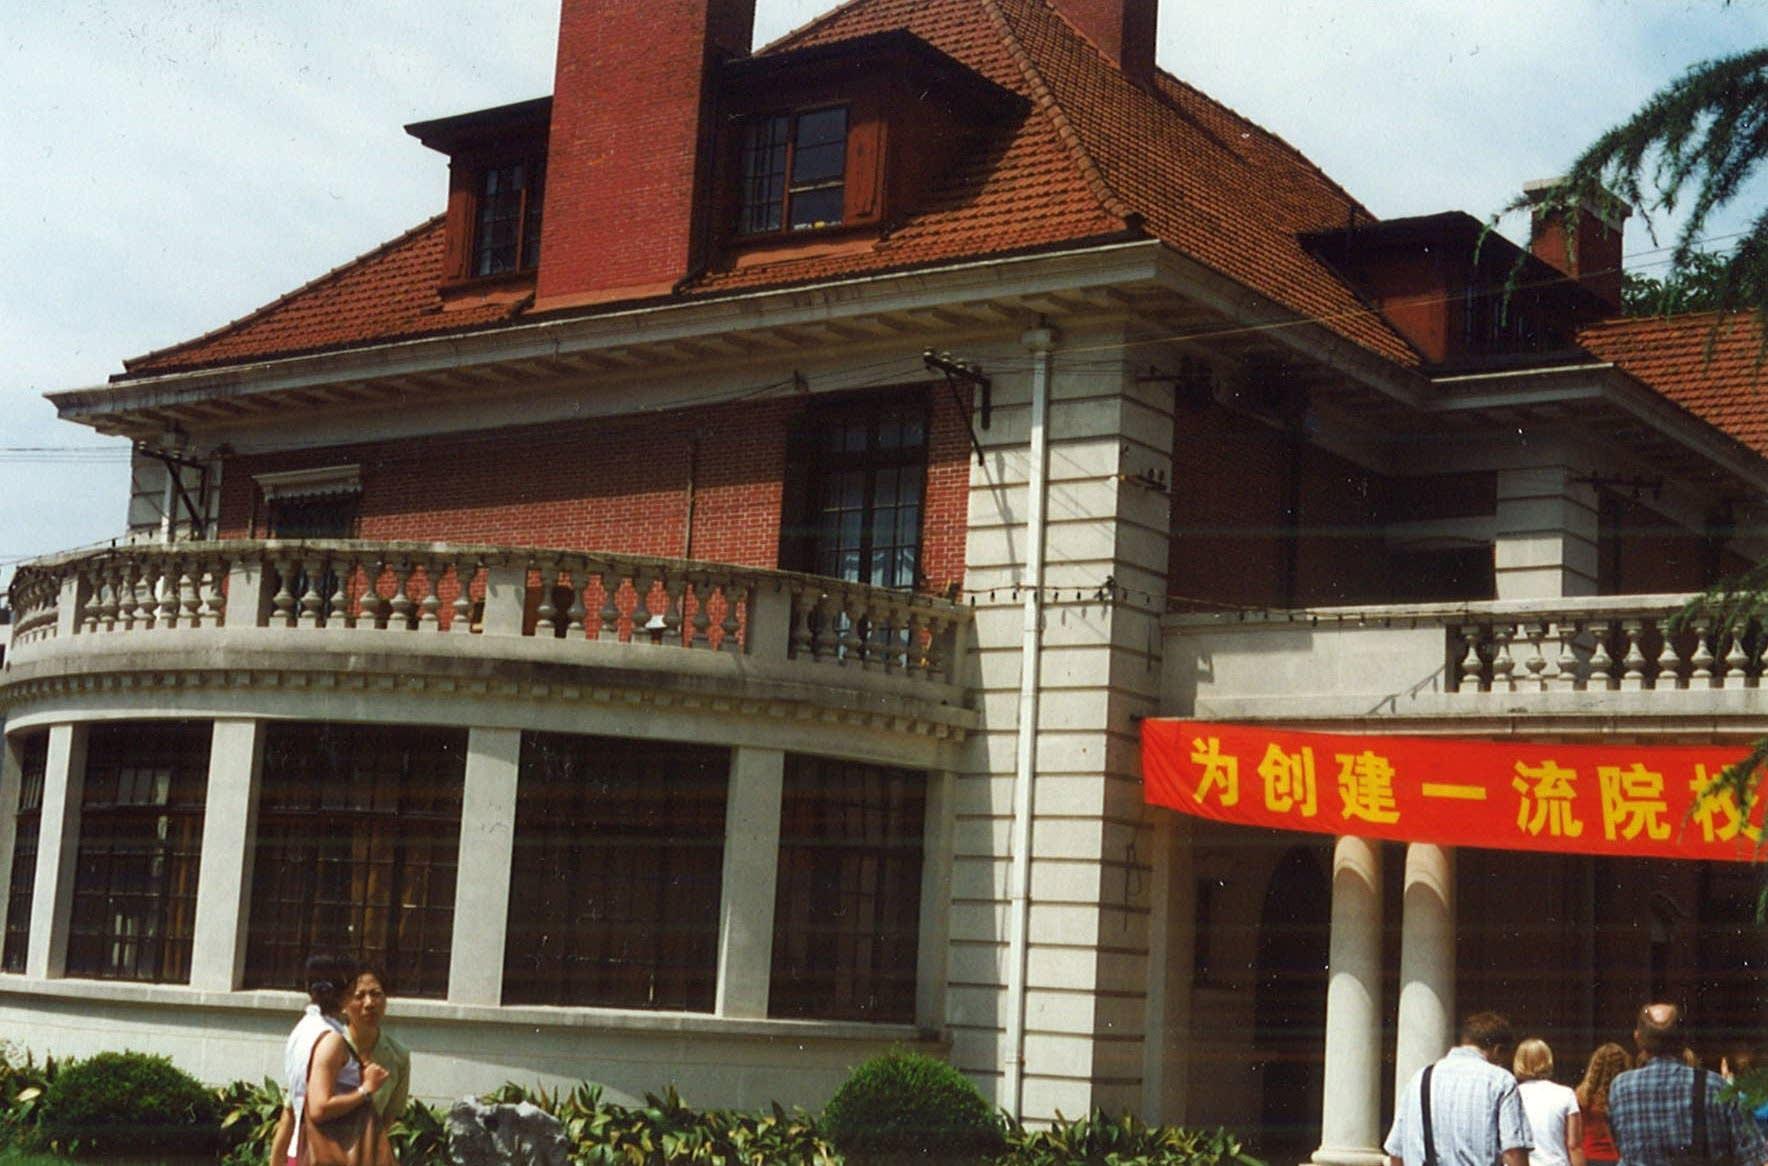 Shanghai Mindy Ratner